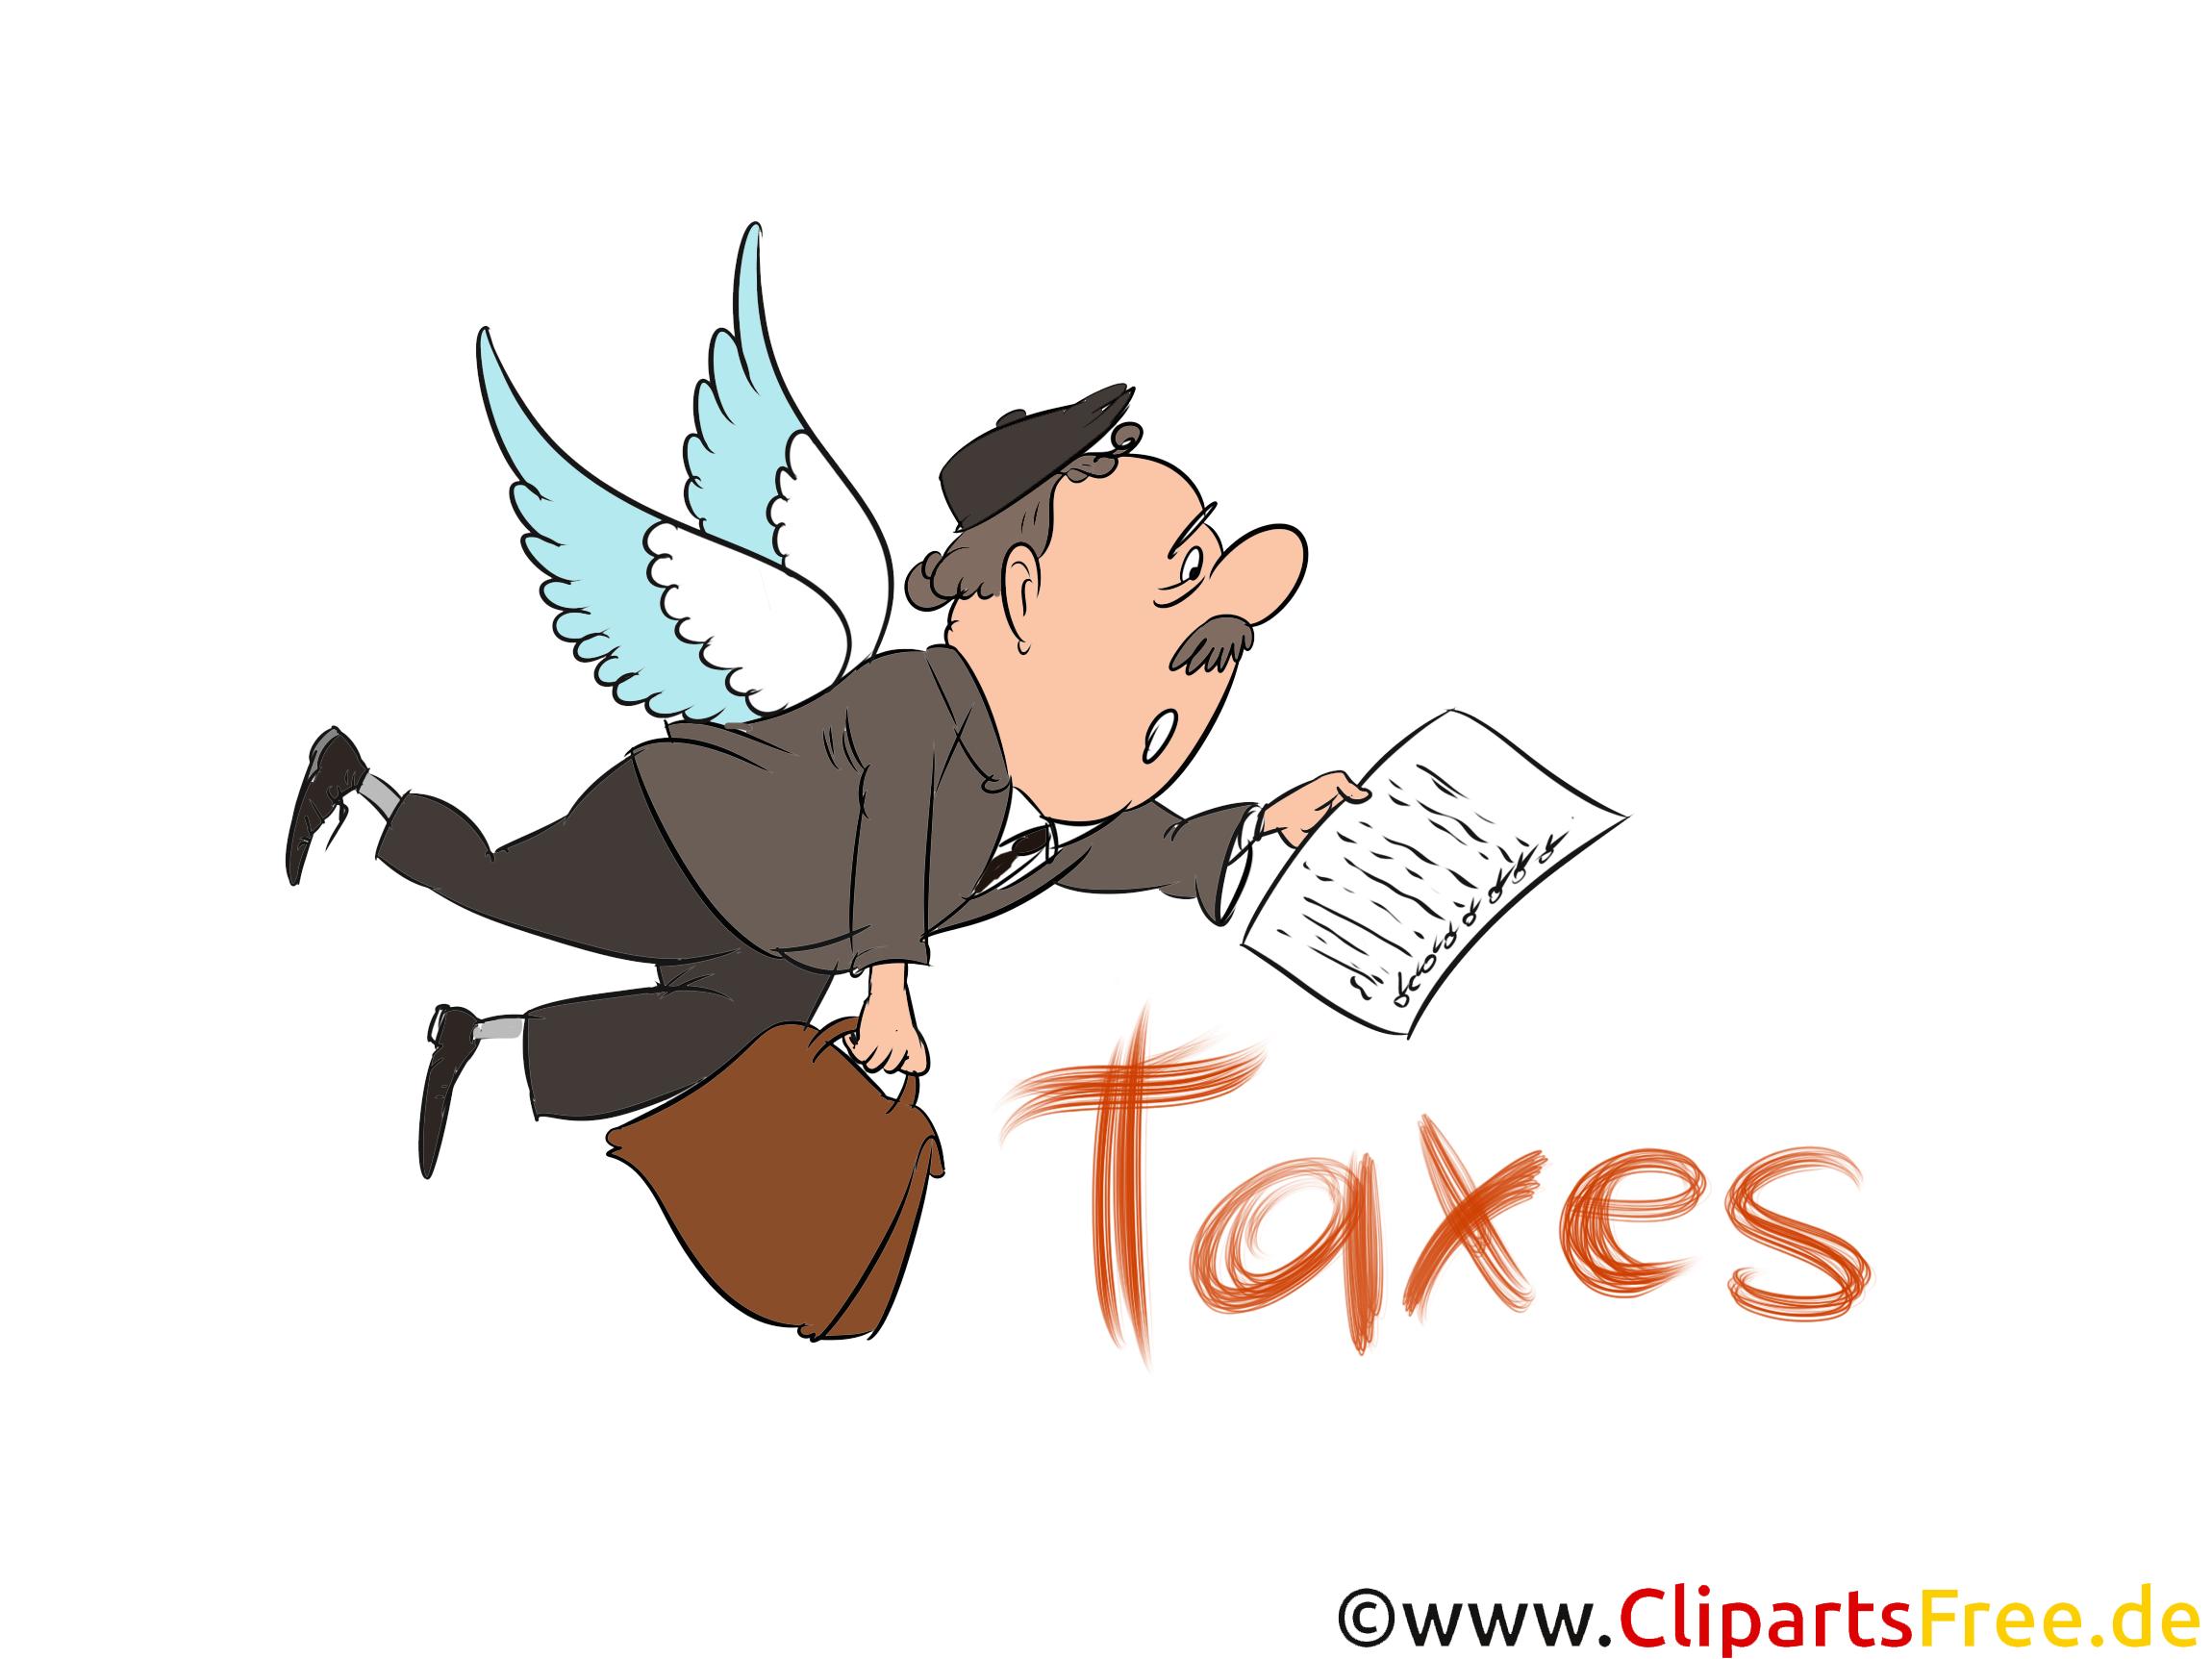 Taxes Clip Art, Image, Illustration